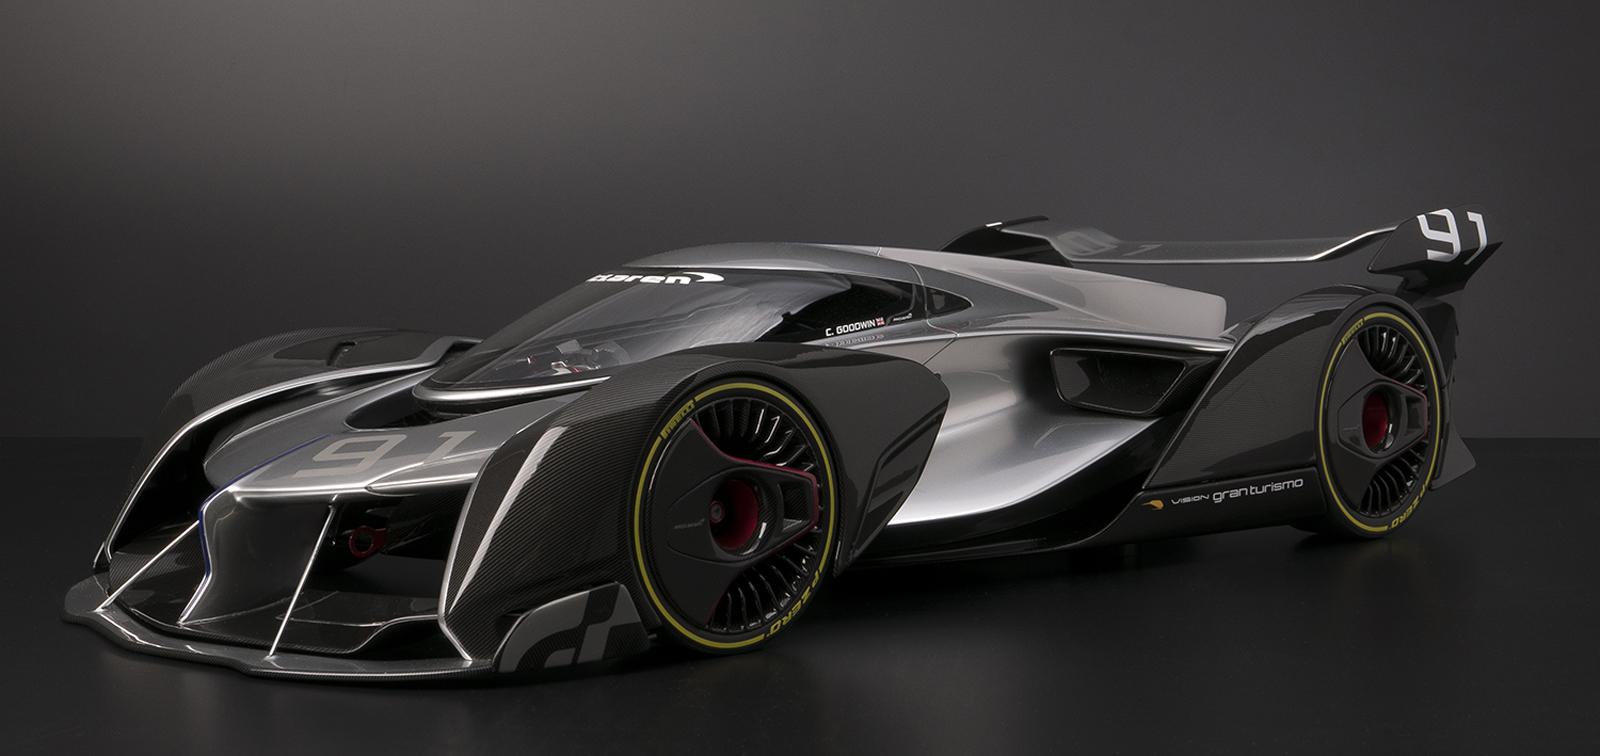 McLaren Ultimate Vision Gran Turismo Comes To Life In 1:8 ...